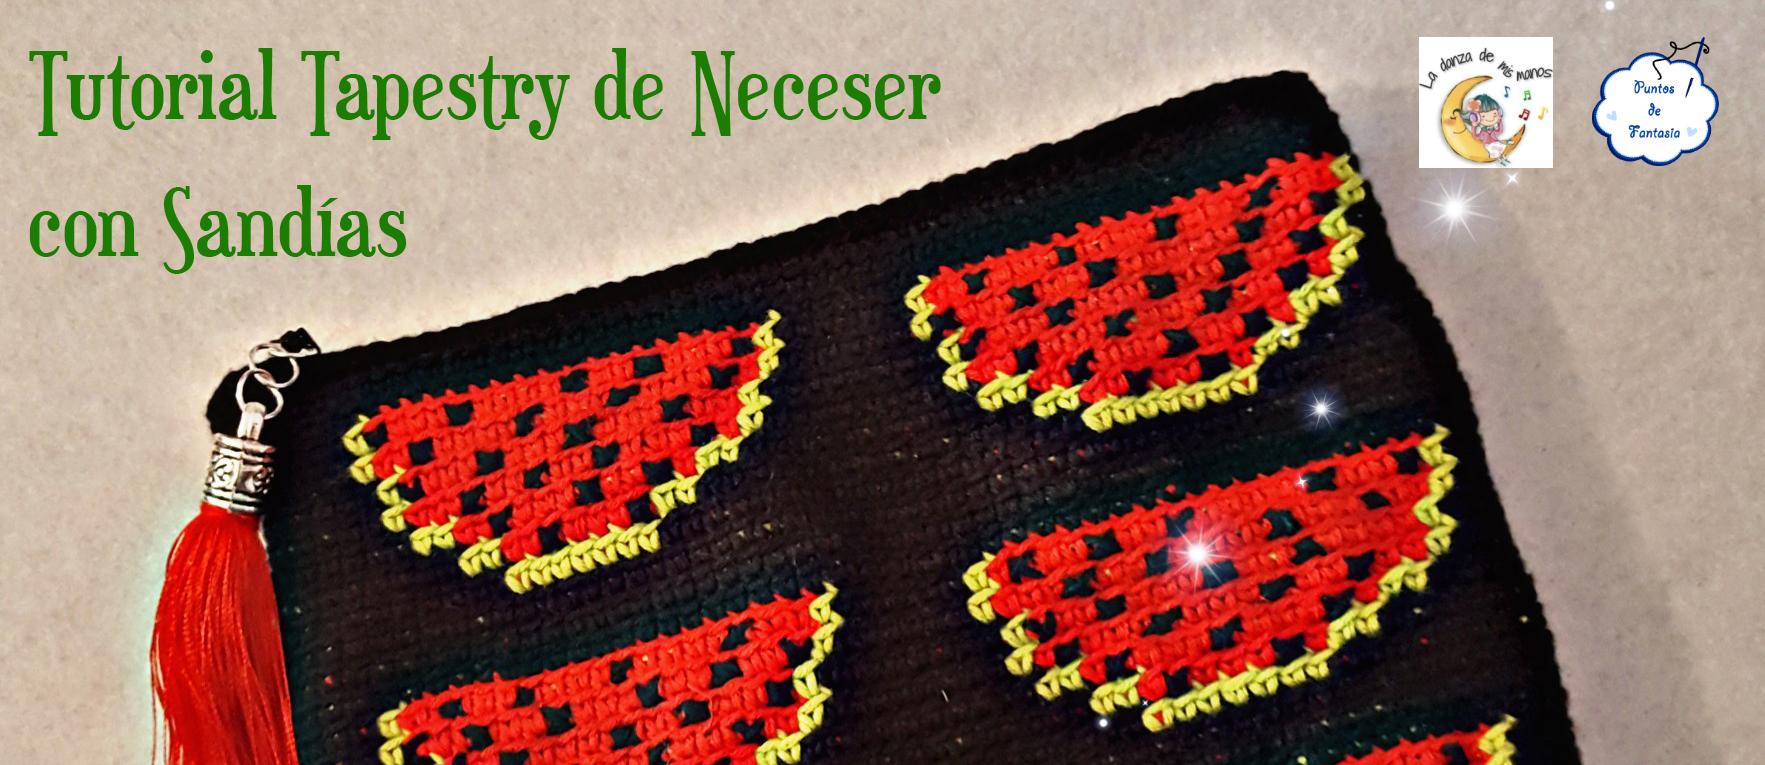 Tutorial Tapestry de Neceser de Sandias